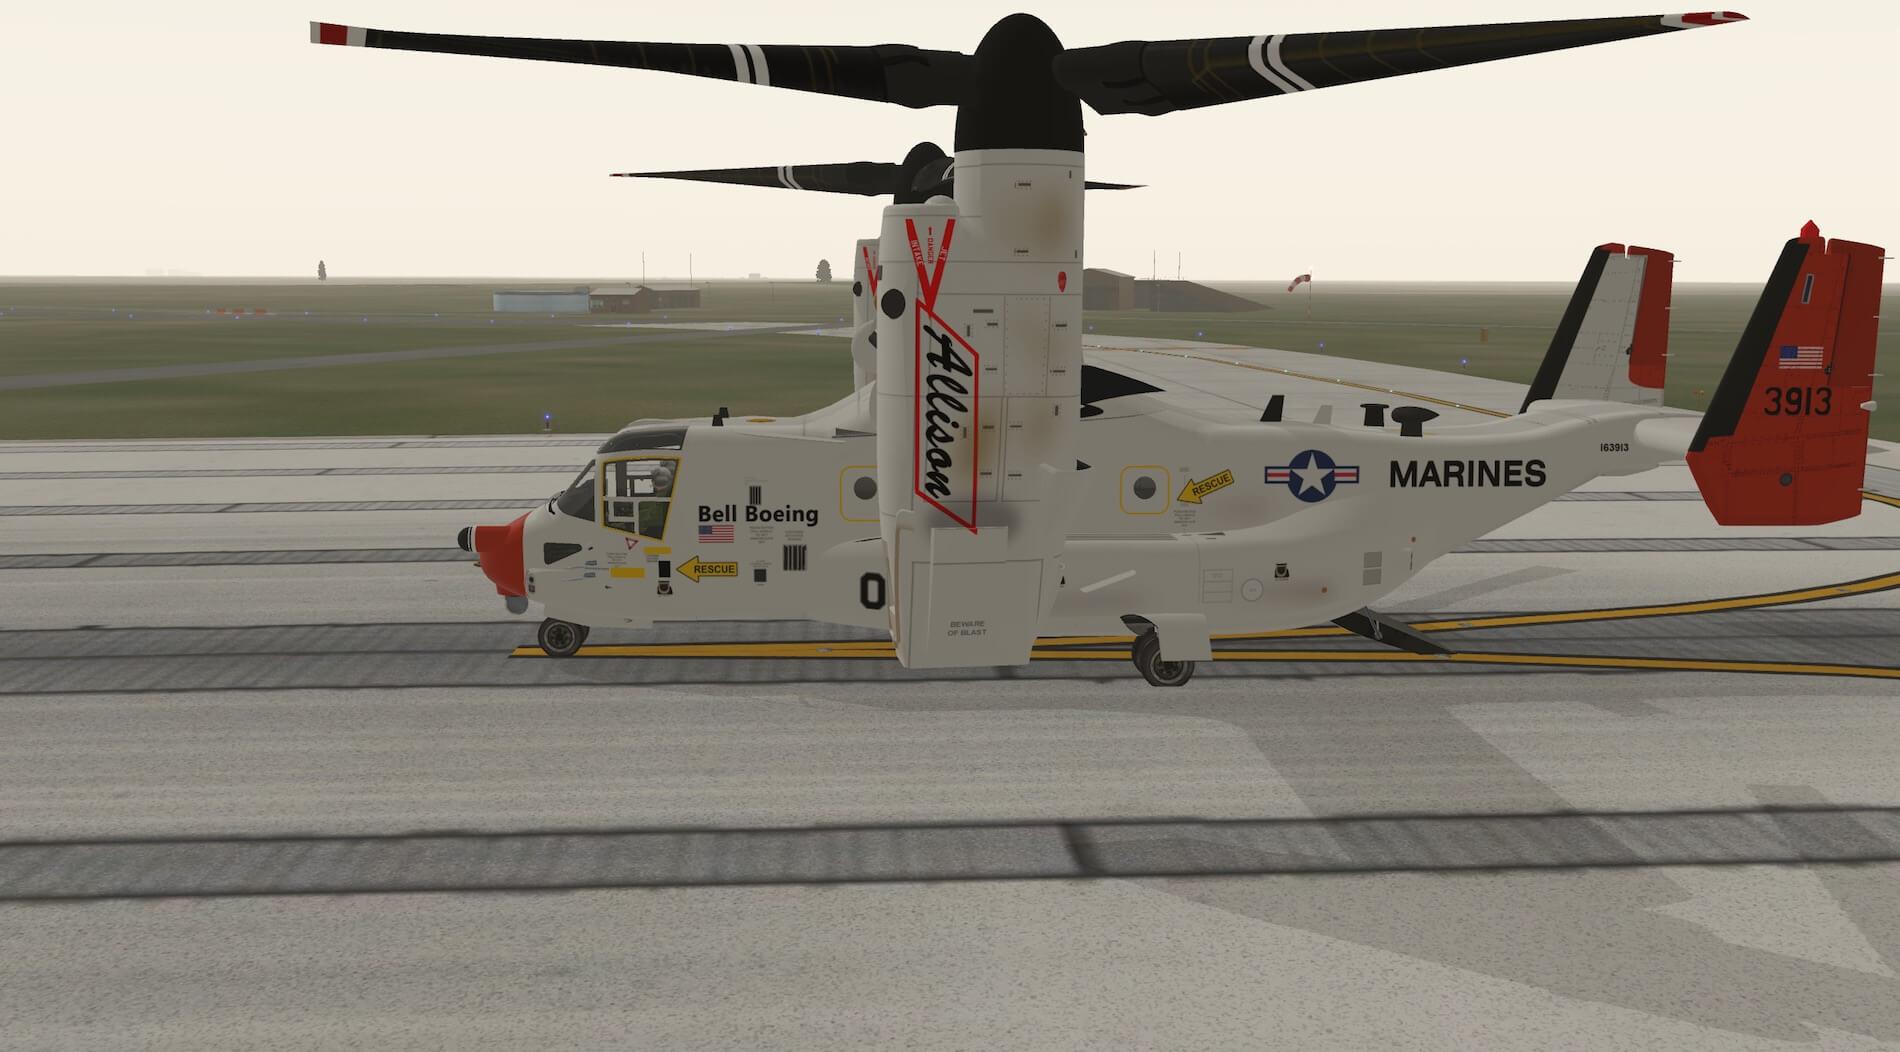 review aoa simulations boeing v 22b osprey x plained the source rh x plained com Osprey Flight Distance V-22 Osprey Flight